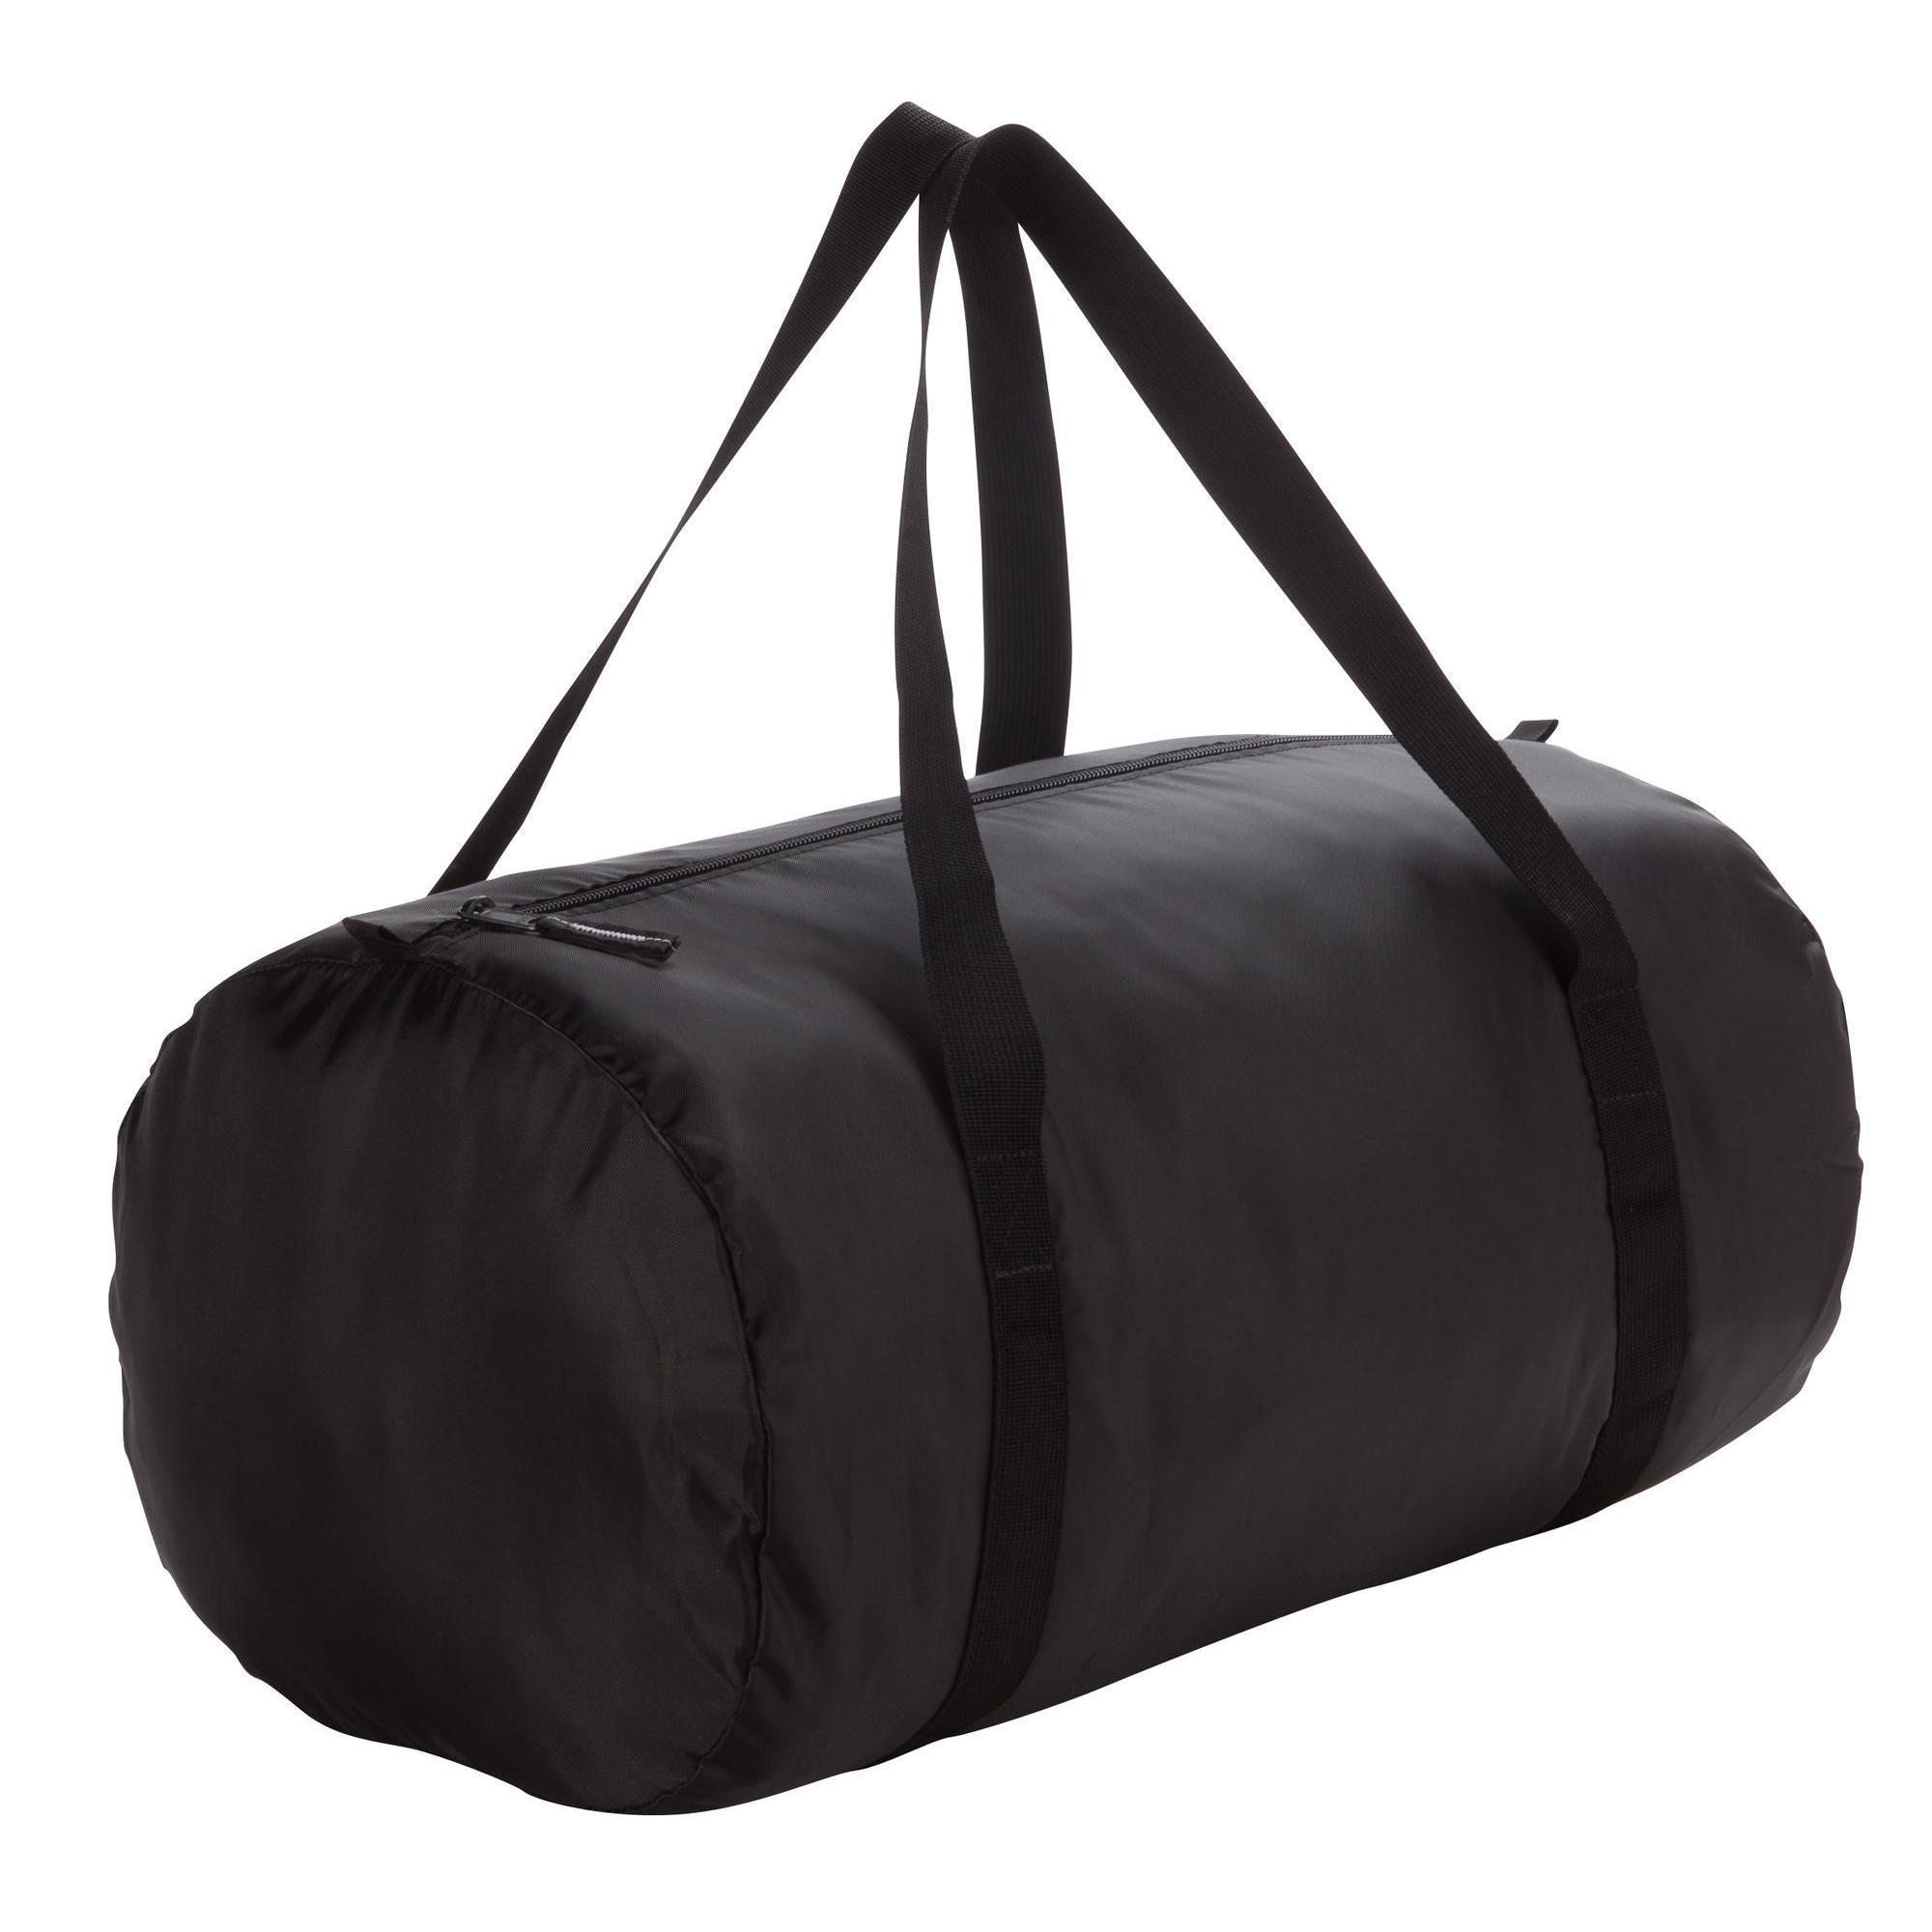 sac fitness pliable 30l noir domyos domyos by decathlon. Black Bedroom Furniture Sets. Home Design Ideas